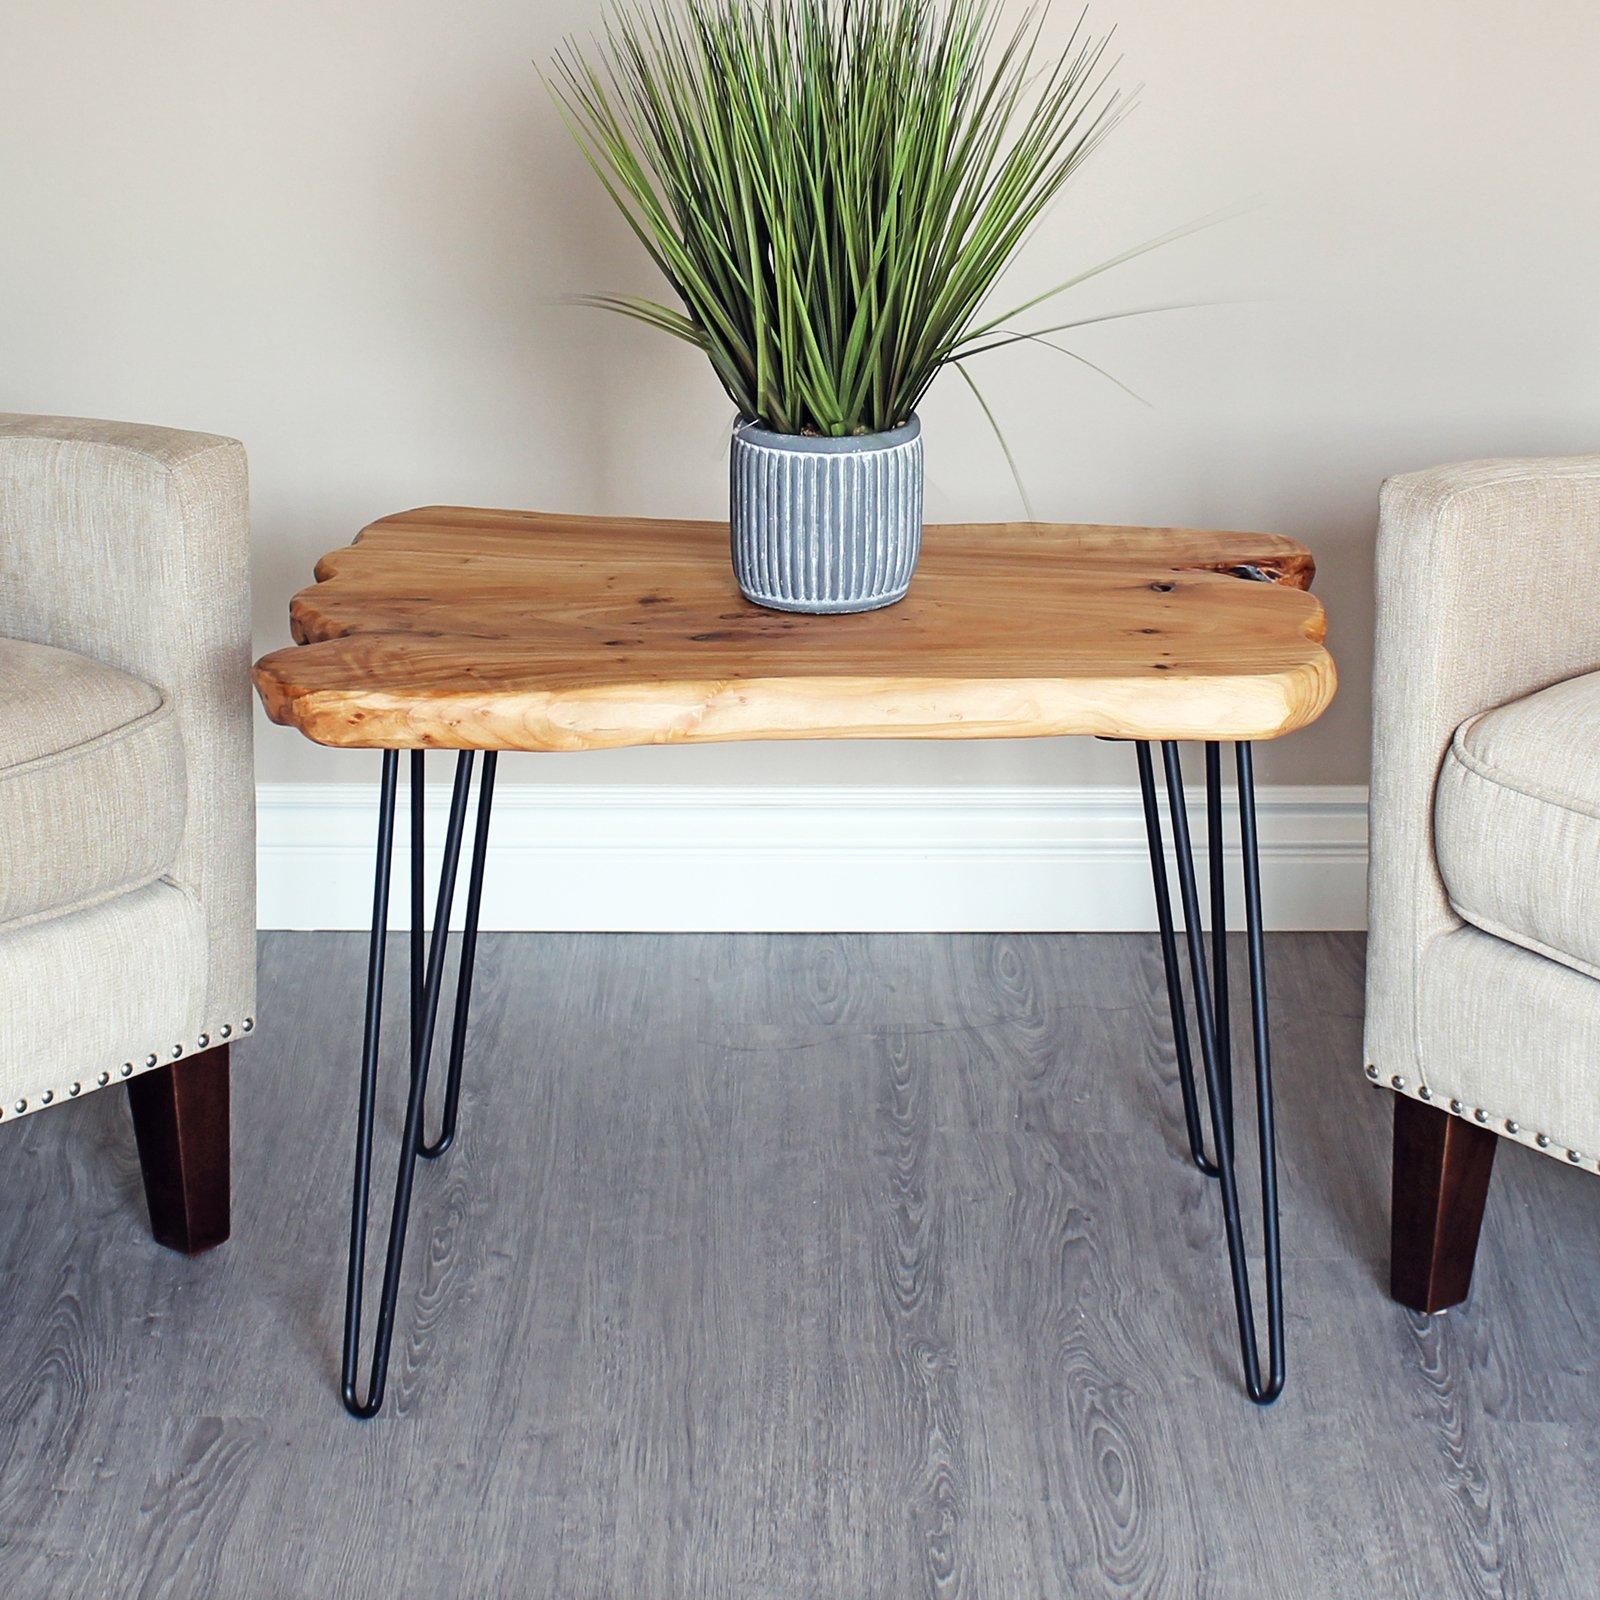 WELLAND Cedar Live Edge Hairpin Coffee Table 28'' L x 20'' W x 20.5'' T by WELLAND (Image #4)